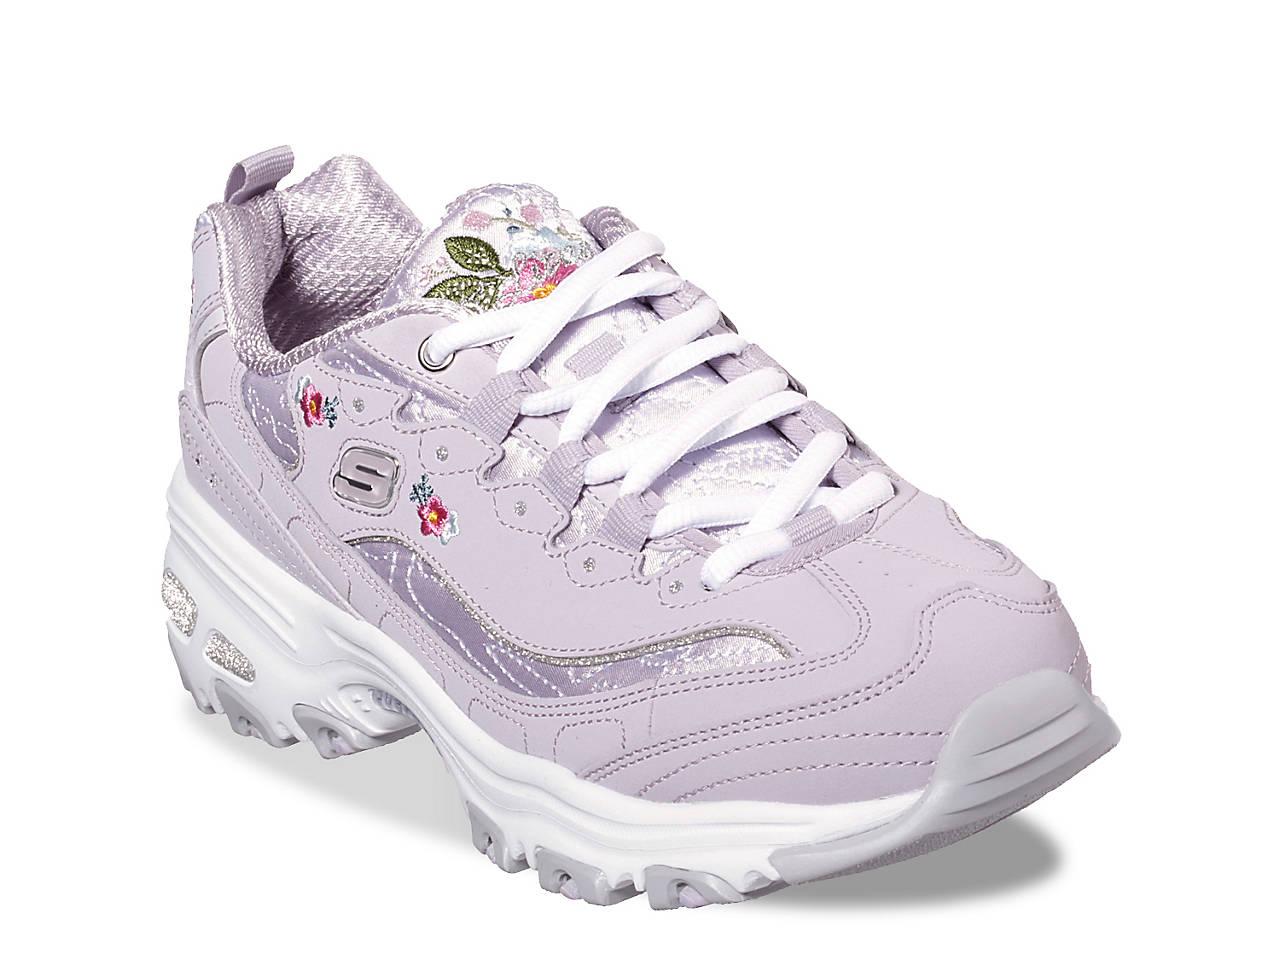 8548613d77b D'Lites Bright Blossoms Sneaker - Women's